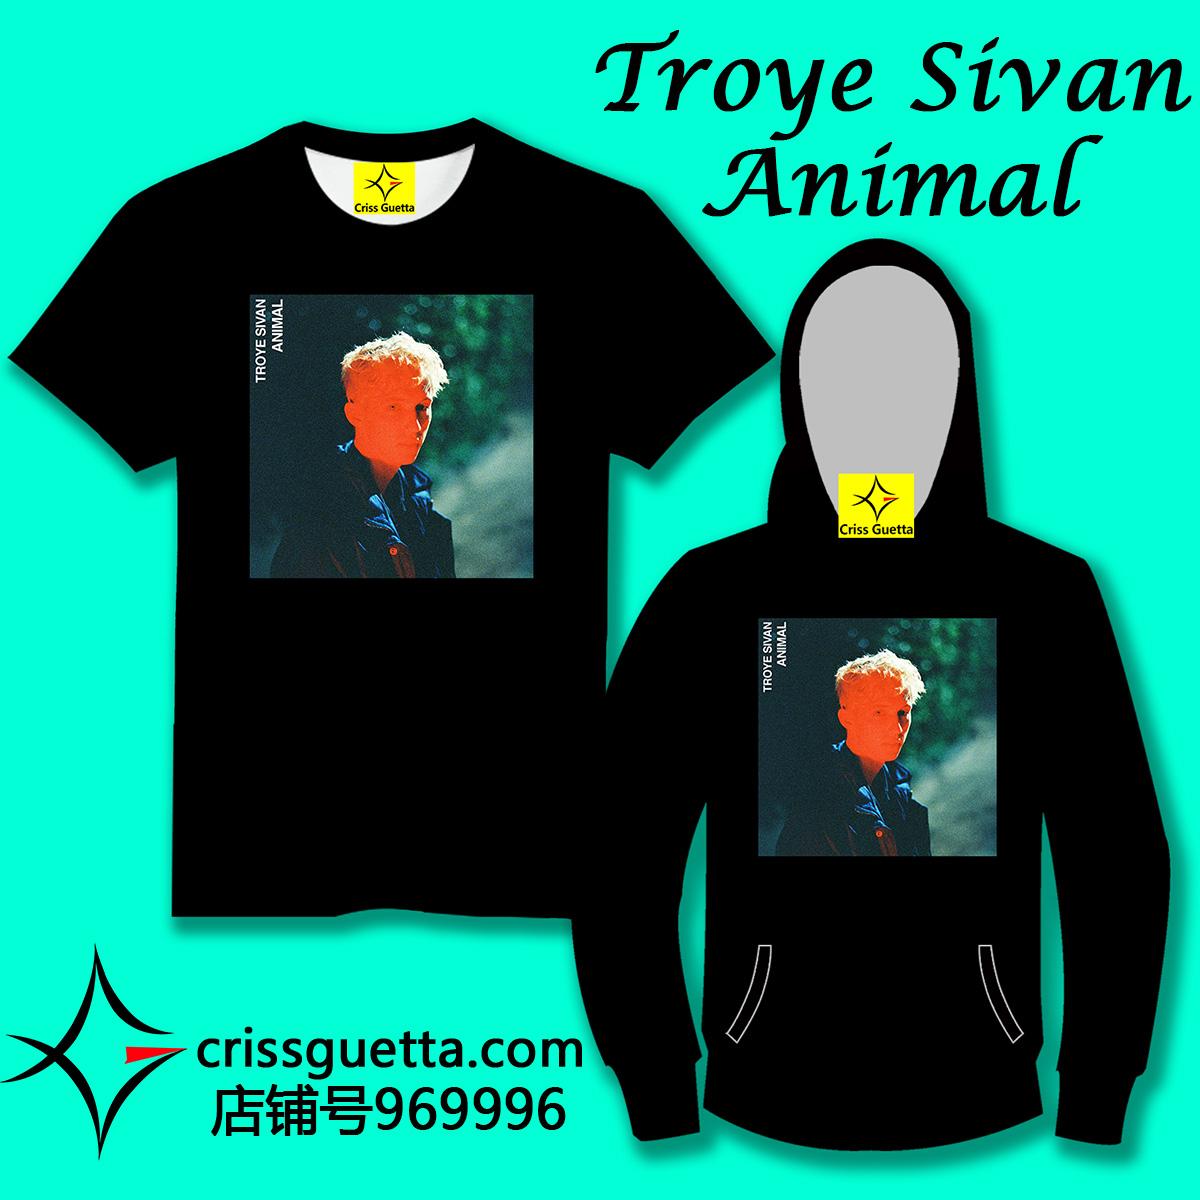 CG Troye Sivan Animal T恤短袖长袖卫衣服外套手机壳 oppo vivo